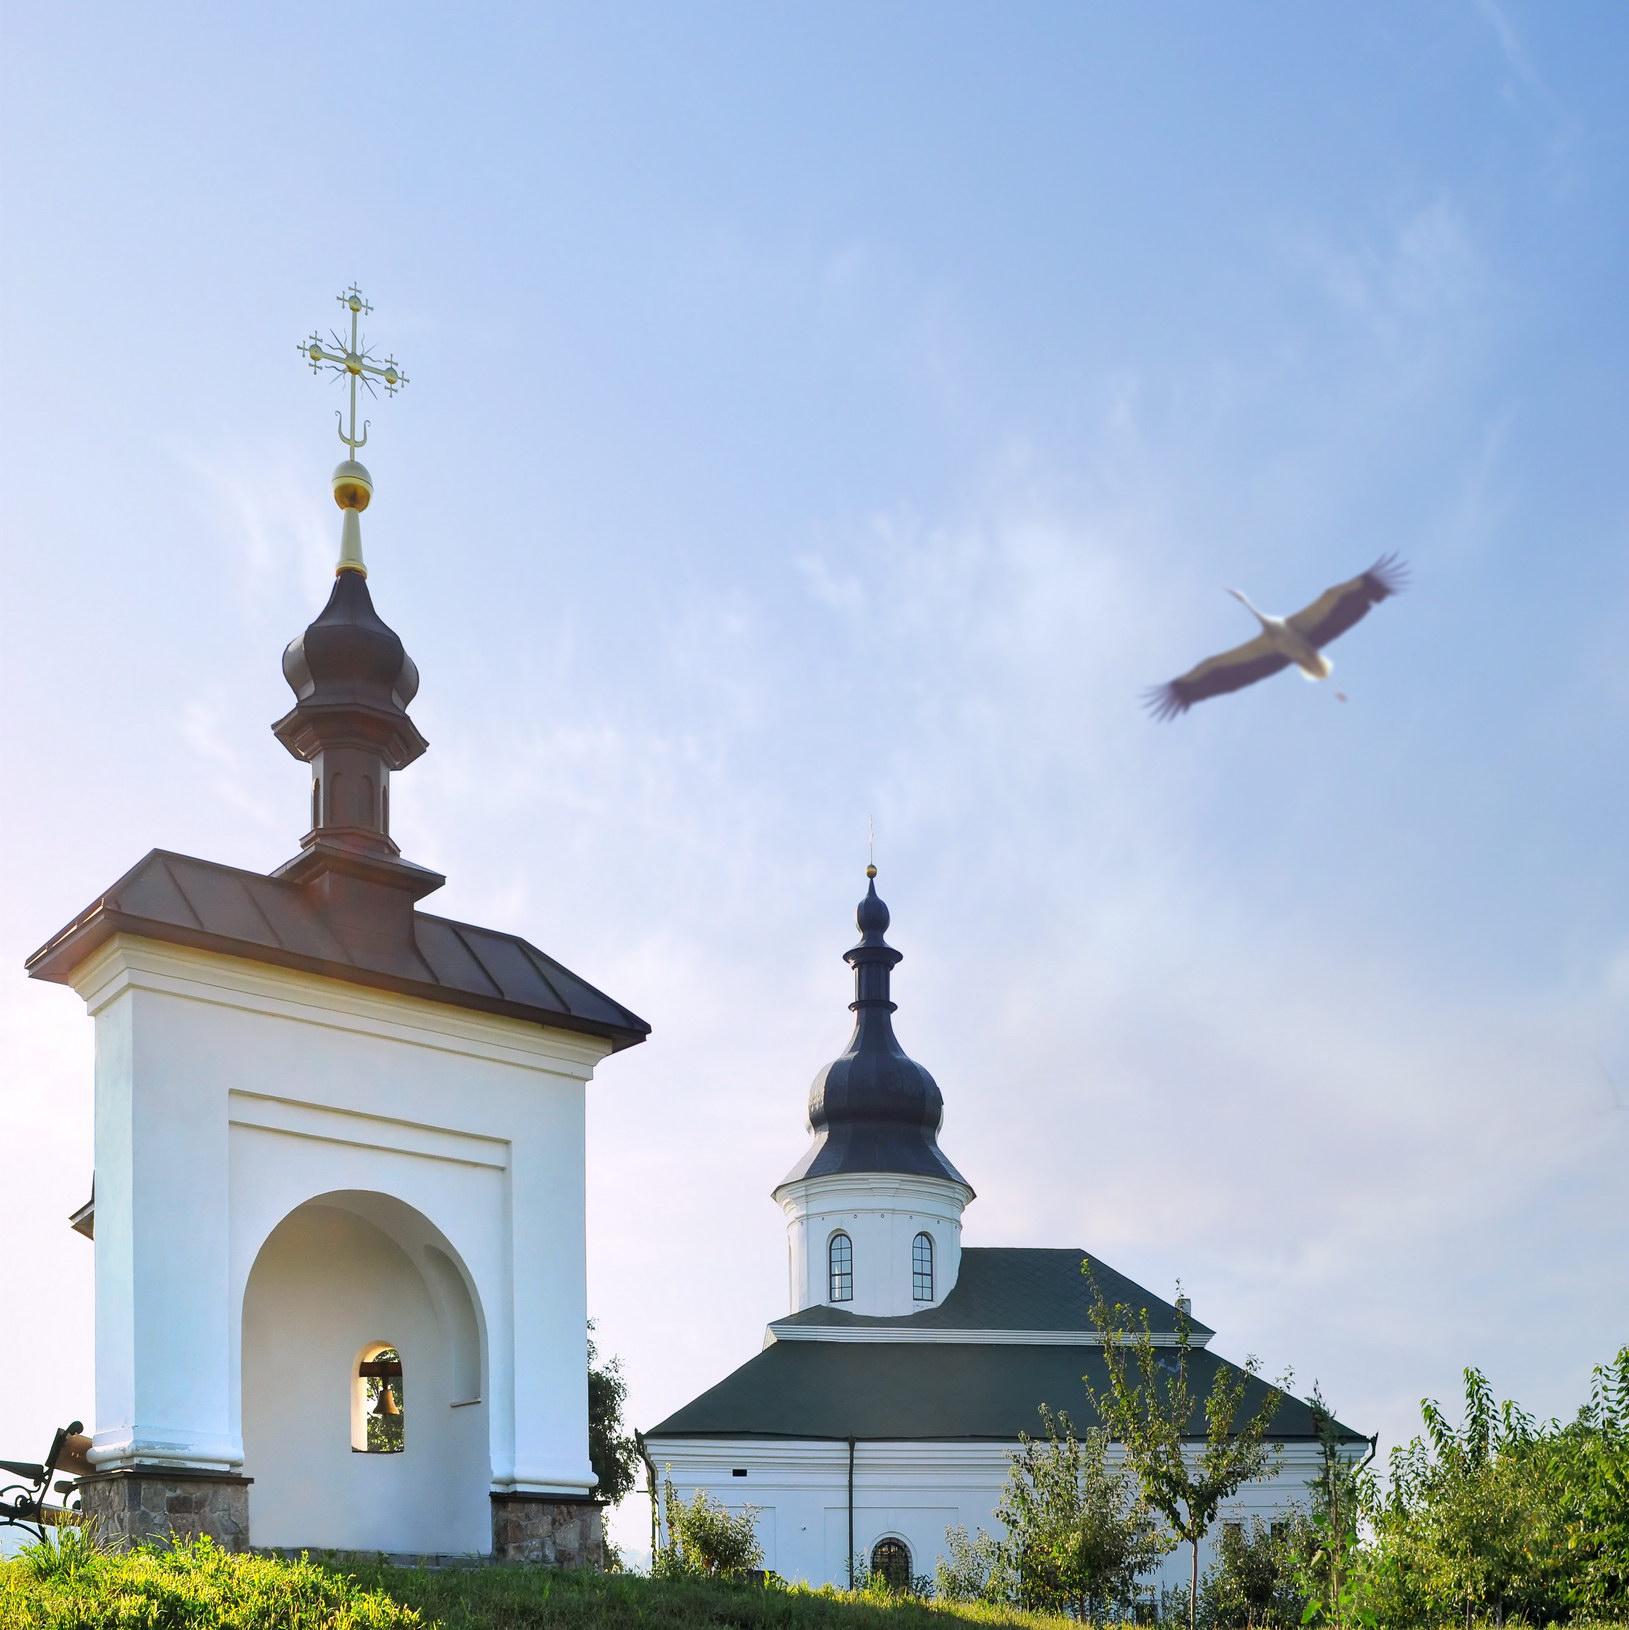 Путешествие по местам силы Богуслав-Тотоха 11 июня.